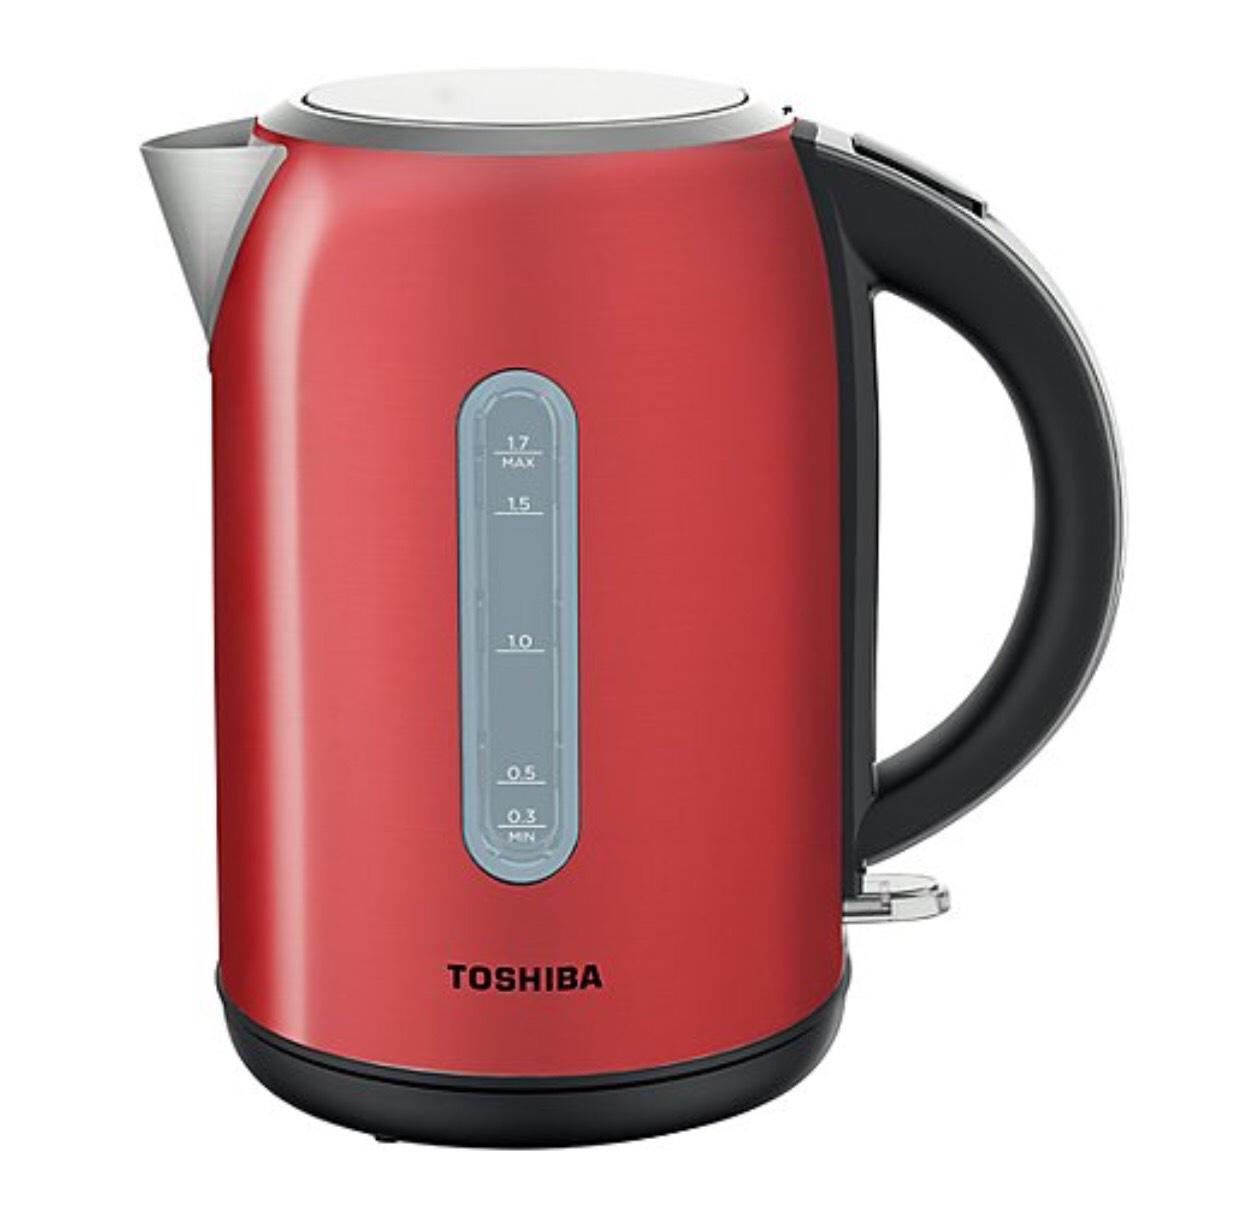 Toshiba KT-17SPPUKR Red Fast Boil 1.7L Kettle £16 + £2.95 del at George (Asda George)